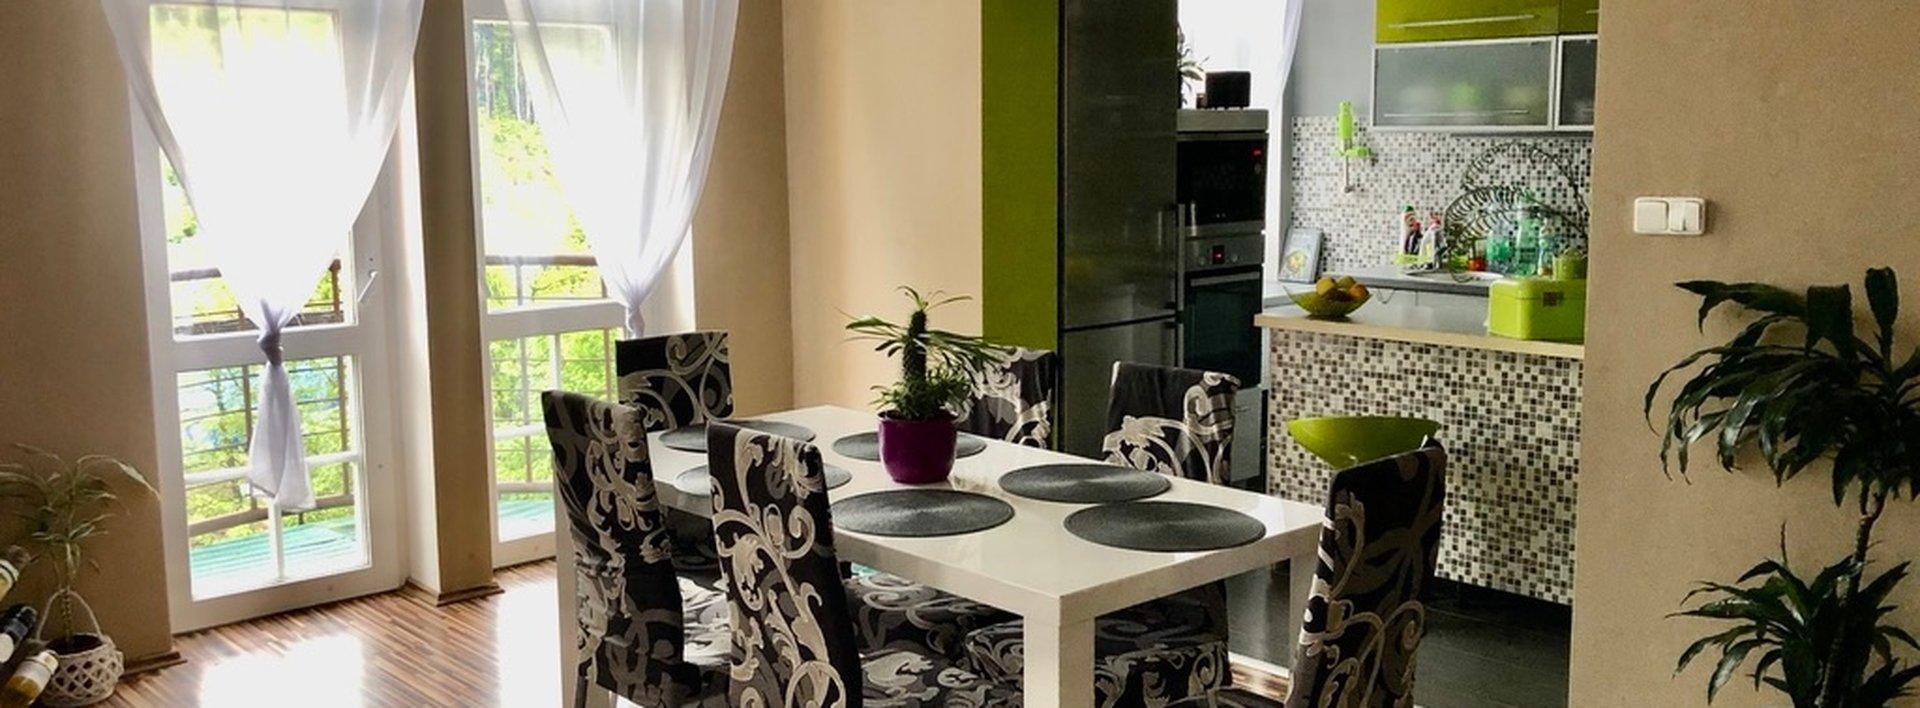 Prodej bytu 4+1 s balkónem, 119 m² + garáž - Jablonec n/N.- Mšeno, Ev.č.: N49070